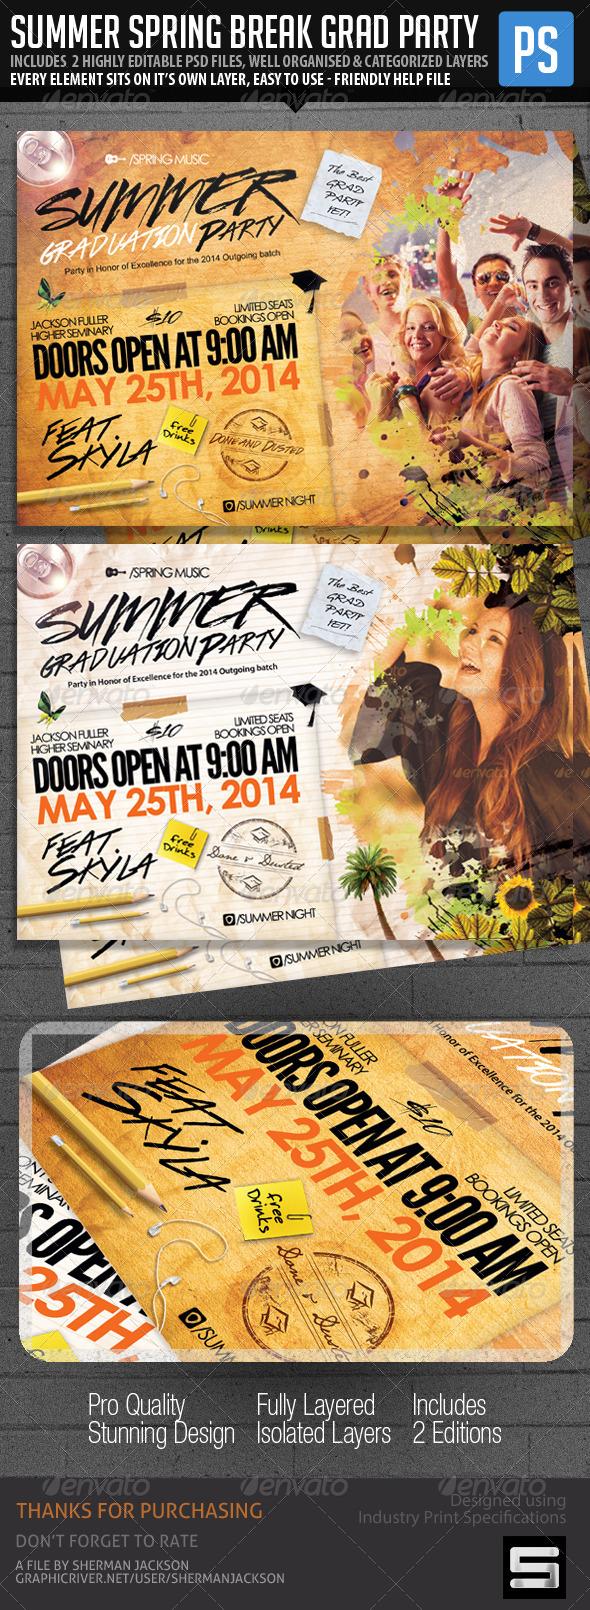 GraphicRiver Summer Graduation & Spring Break Party Flyer 7620878